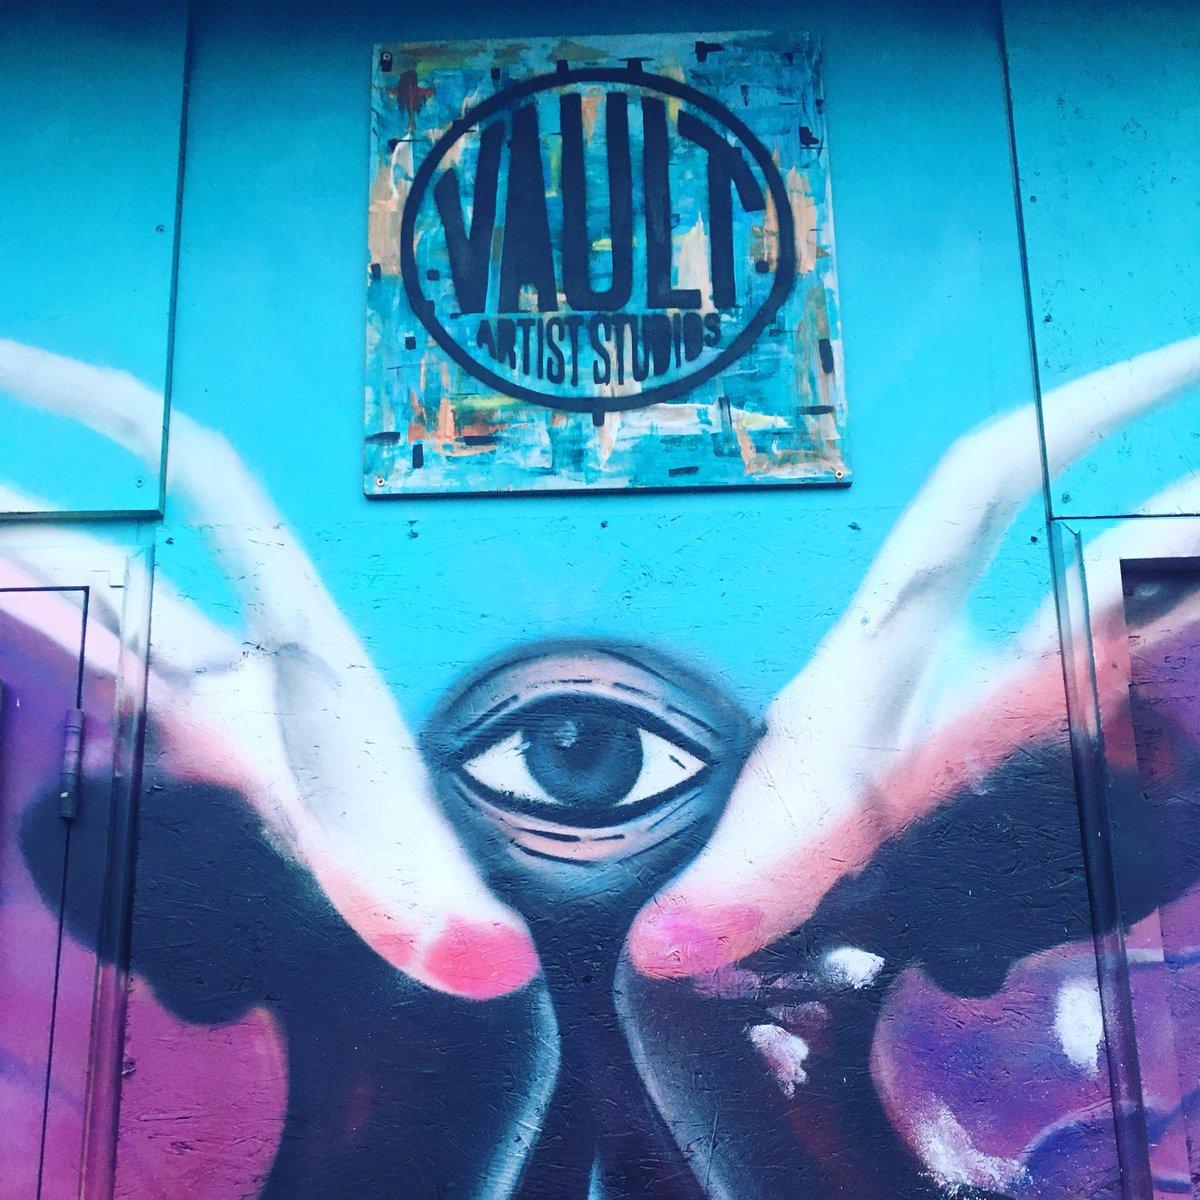 test Twitter Media - I love the creativity in Belfast 😍 @VaultArtistsNI #ArtsMatterNI #YourBelfast https://t.co/DpOOo1rusN